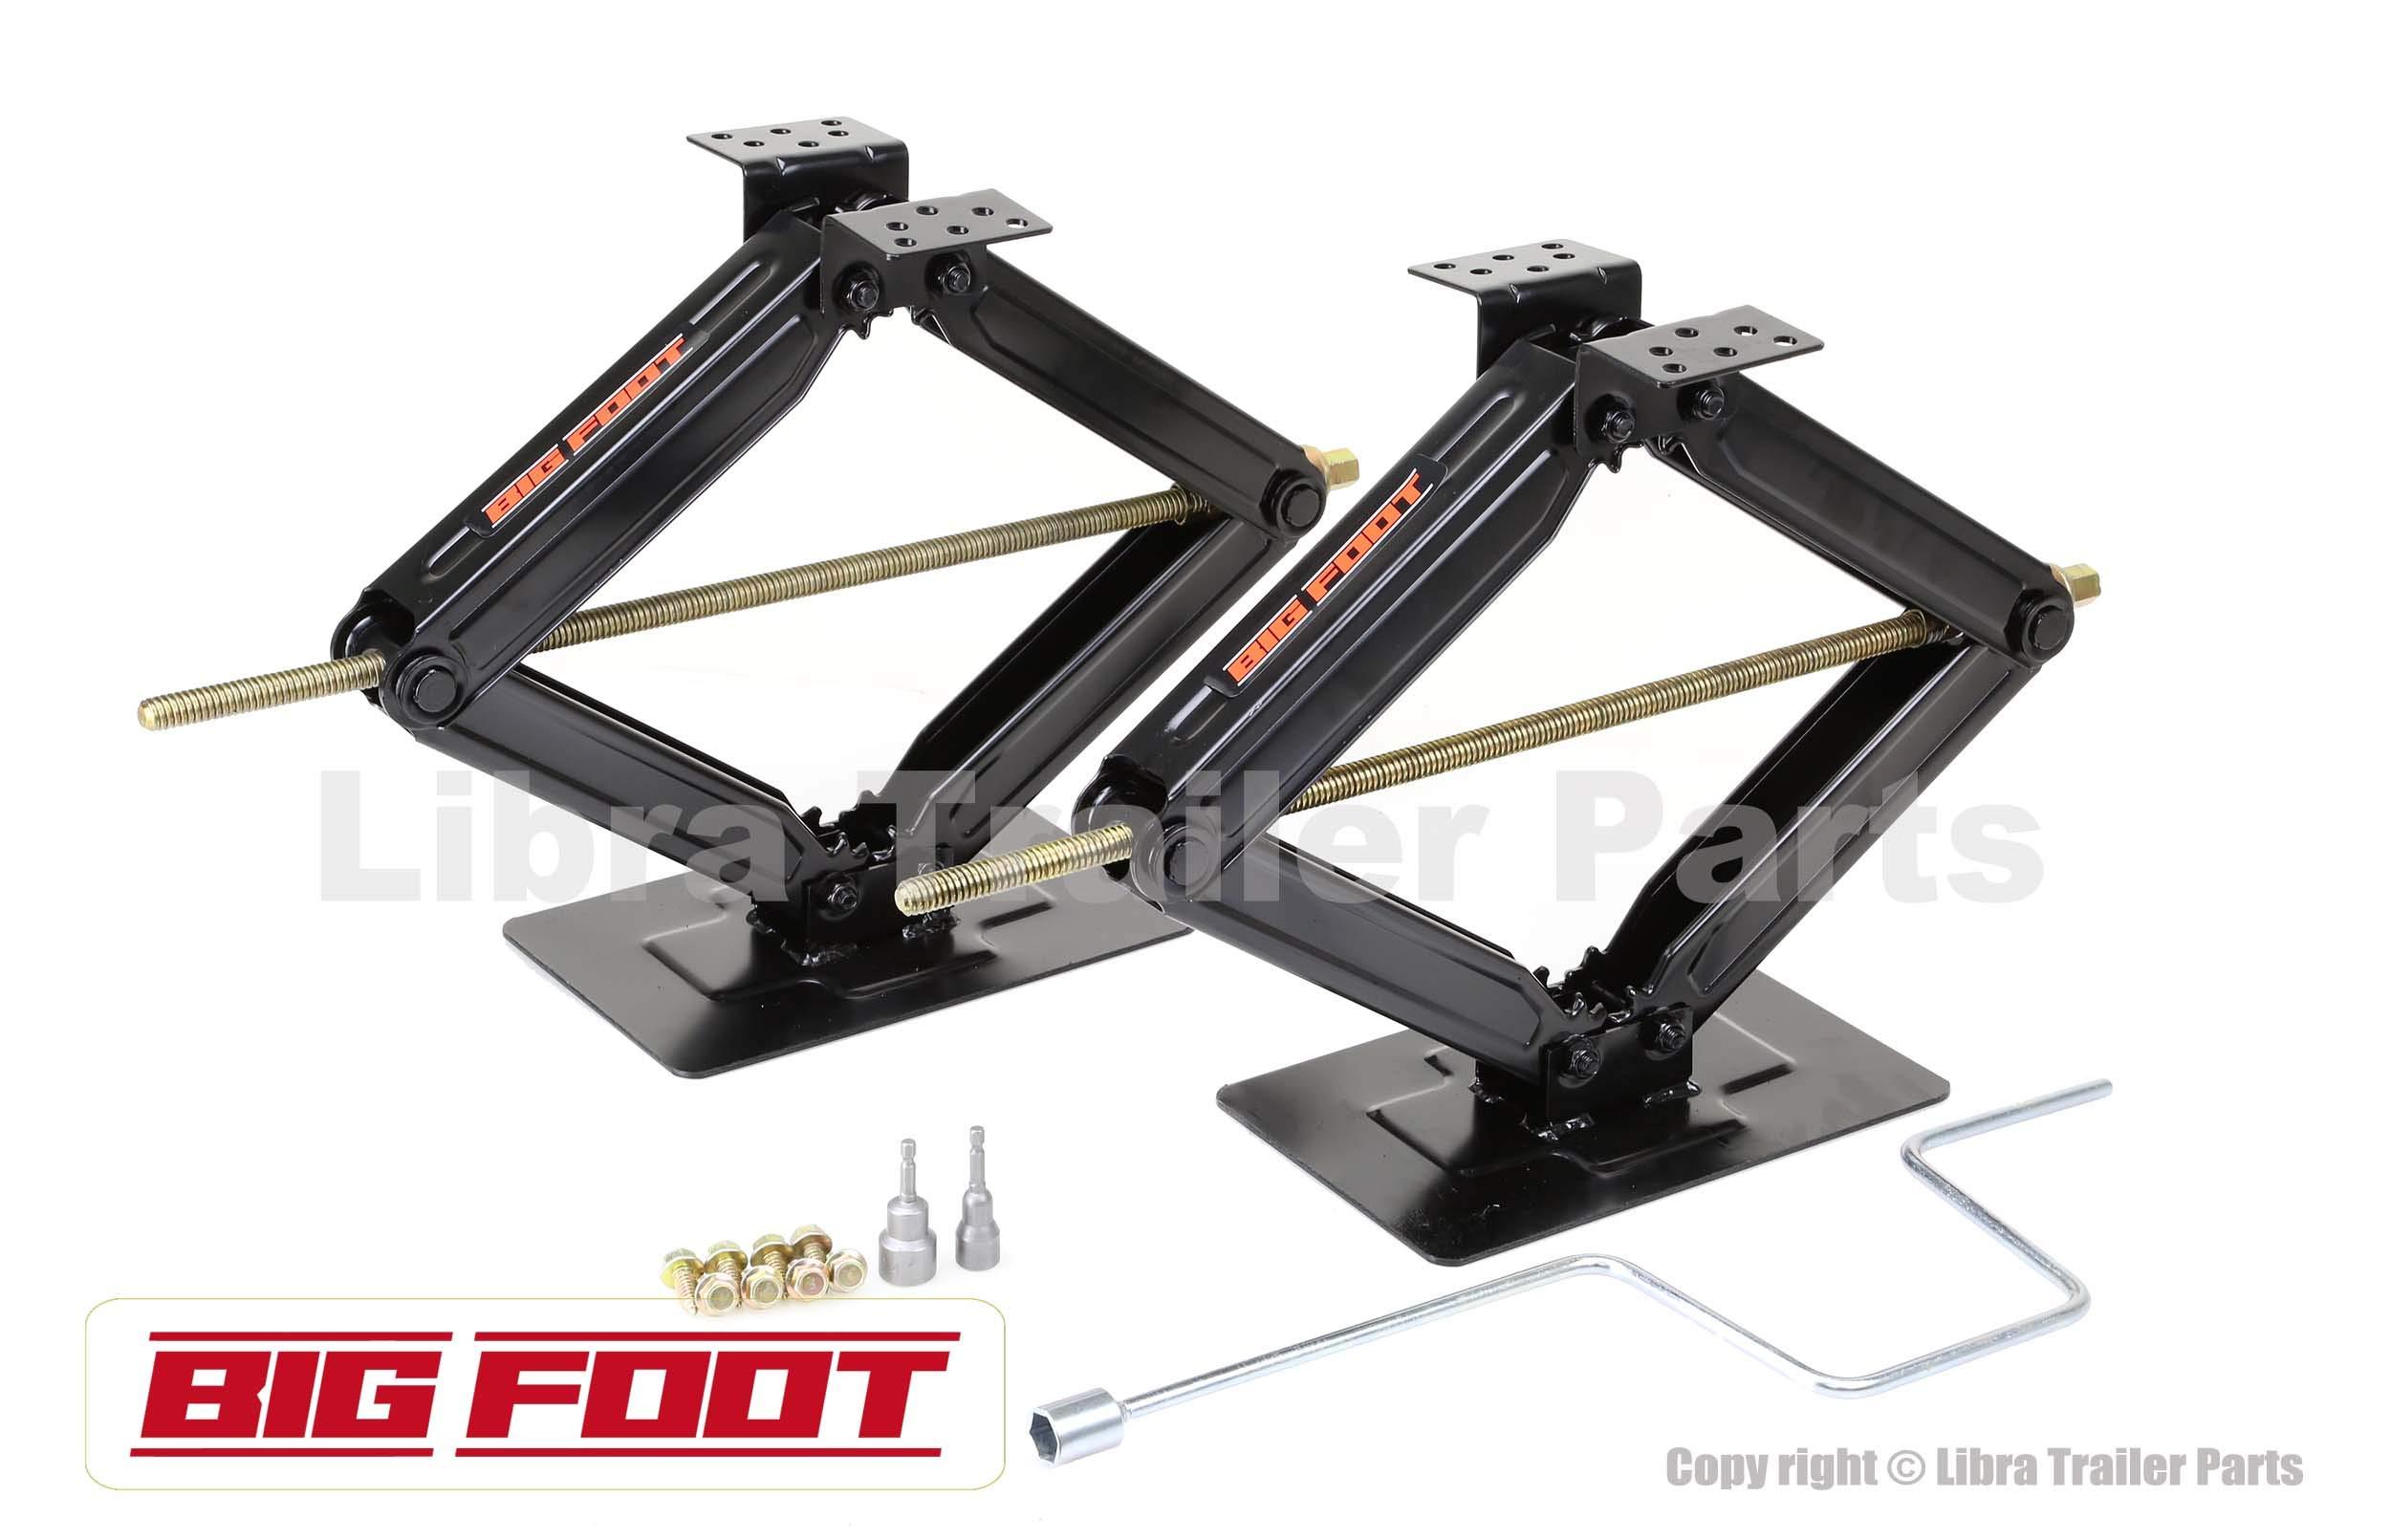 LIBRA Set of 2 Bigfoot 5000 lb 24'' RV Trailer Stabilizer Leveling Scissor Jacks w/Handle & Dual Power Drill Sockets & Hardware -Part#26044 by LIBRA